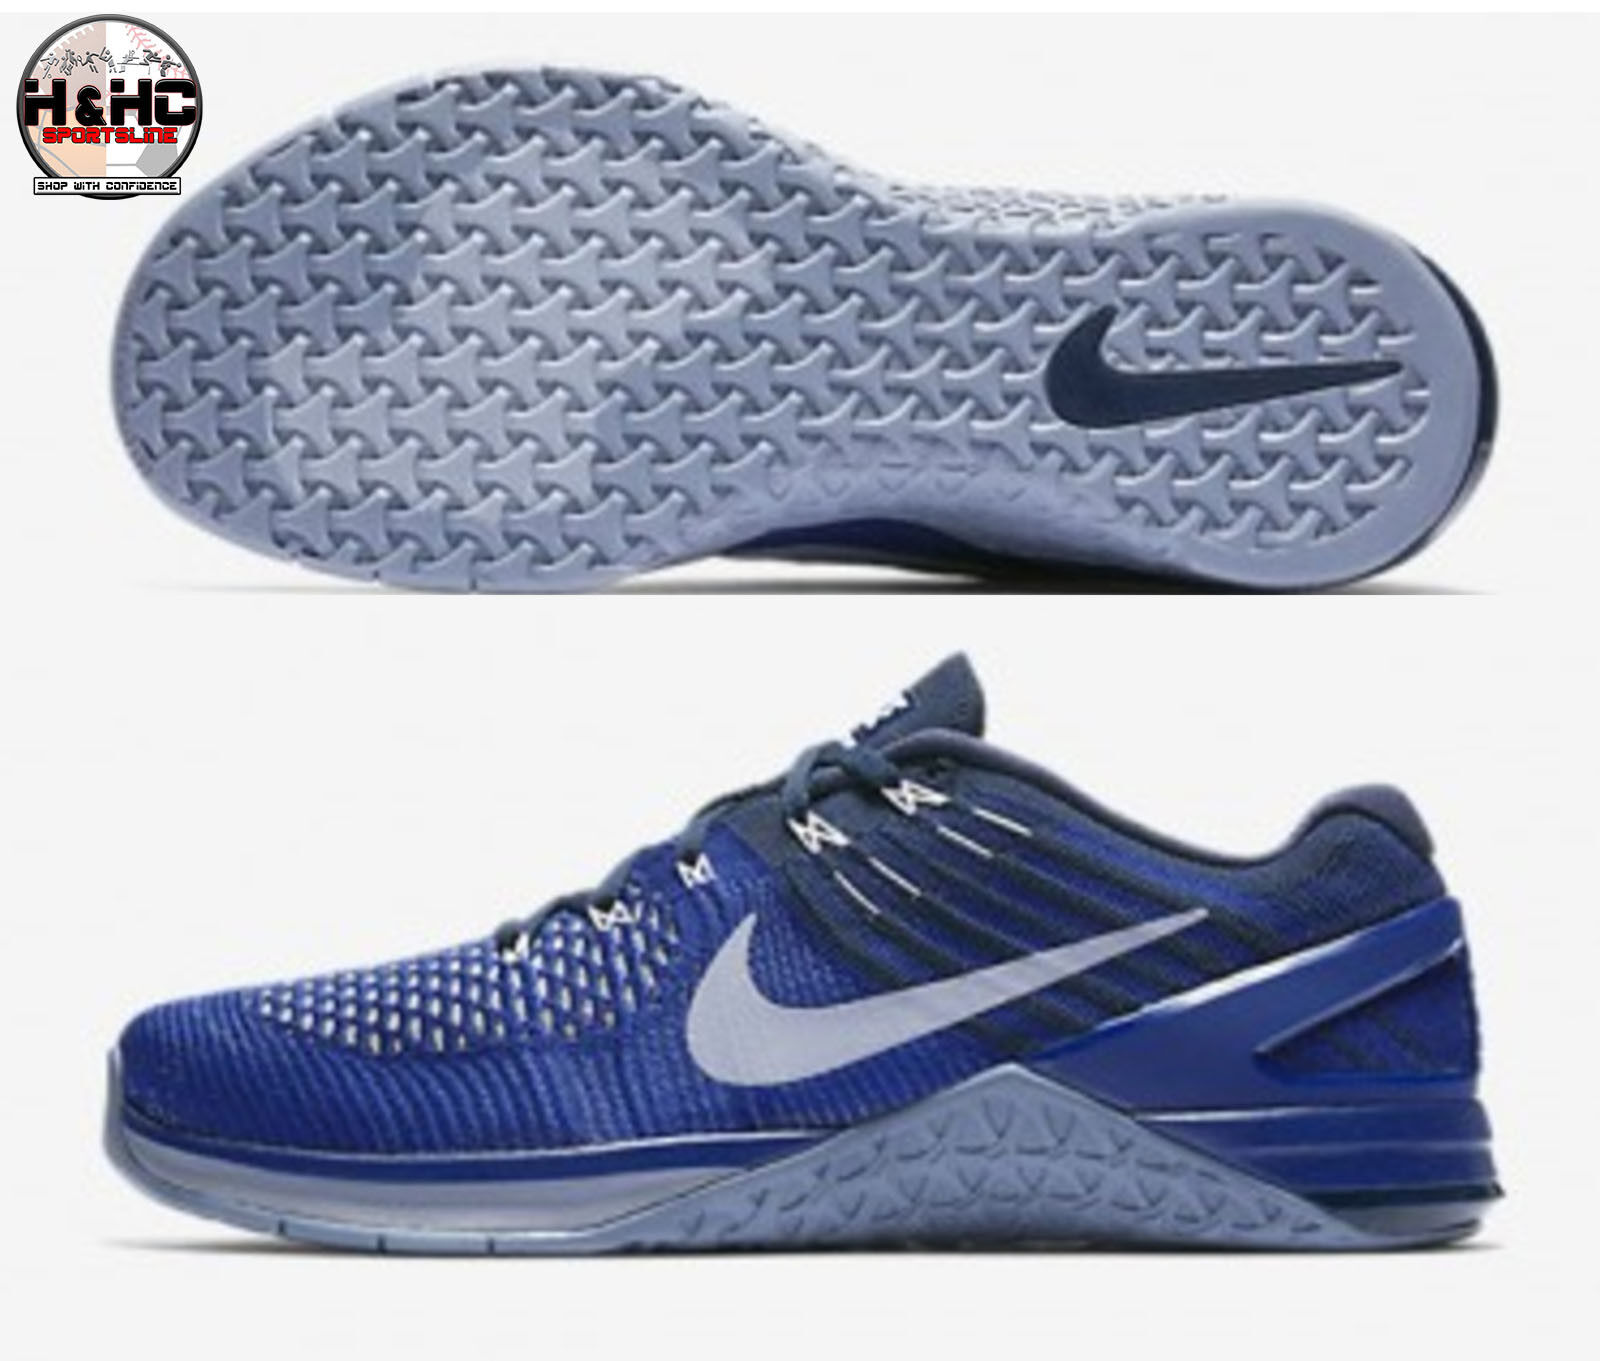 Nike Nike Nike metcon dsx flyknit 852930 403 royal Blau / blaue männer trainingsschuh sz. 838148